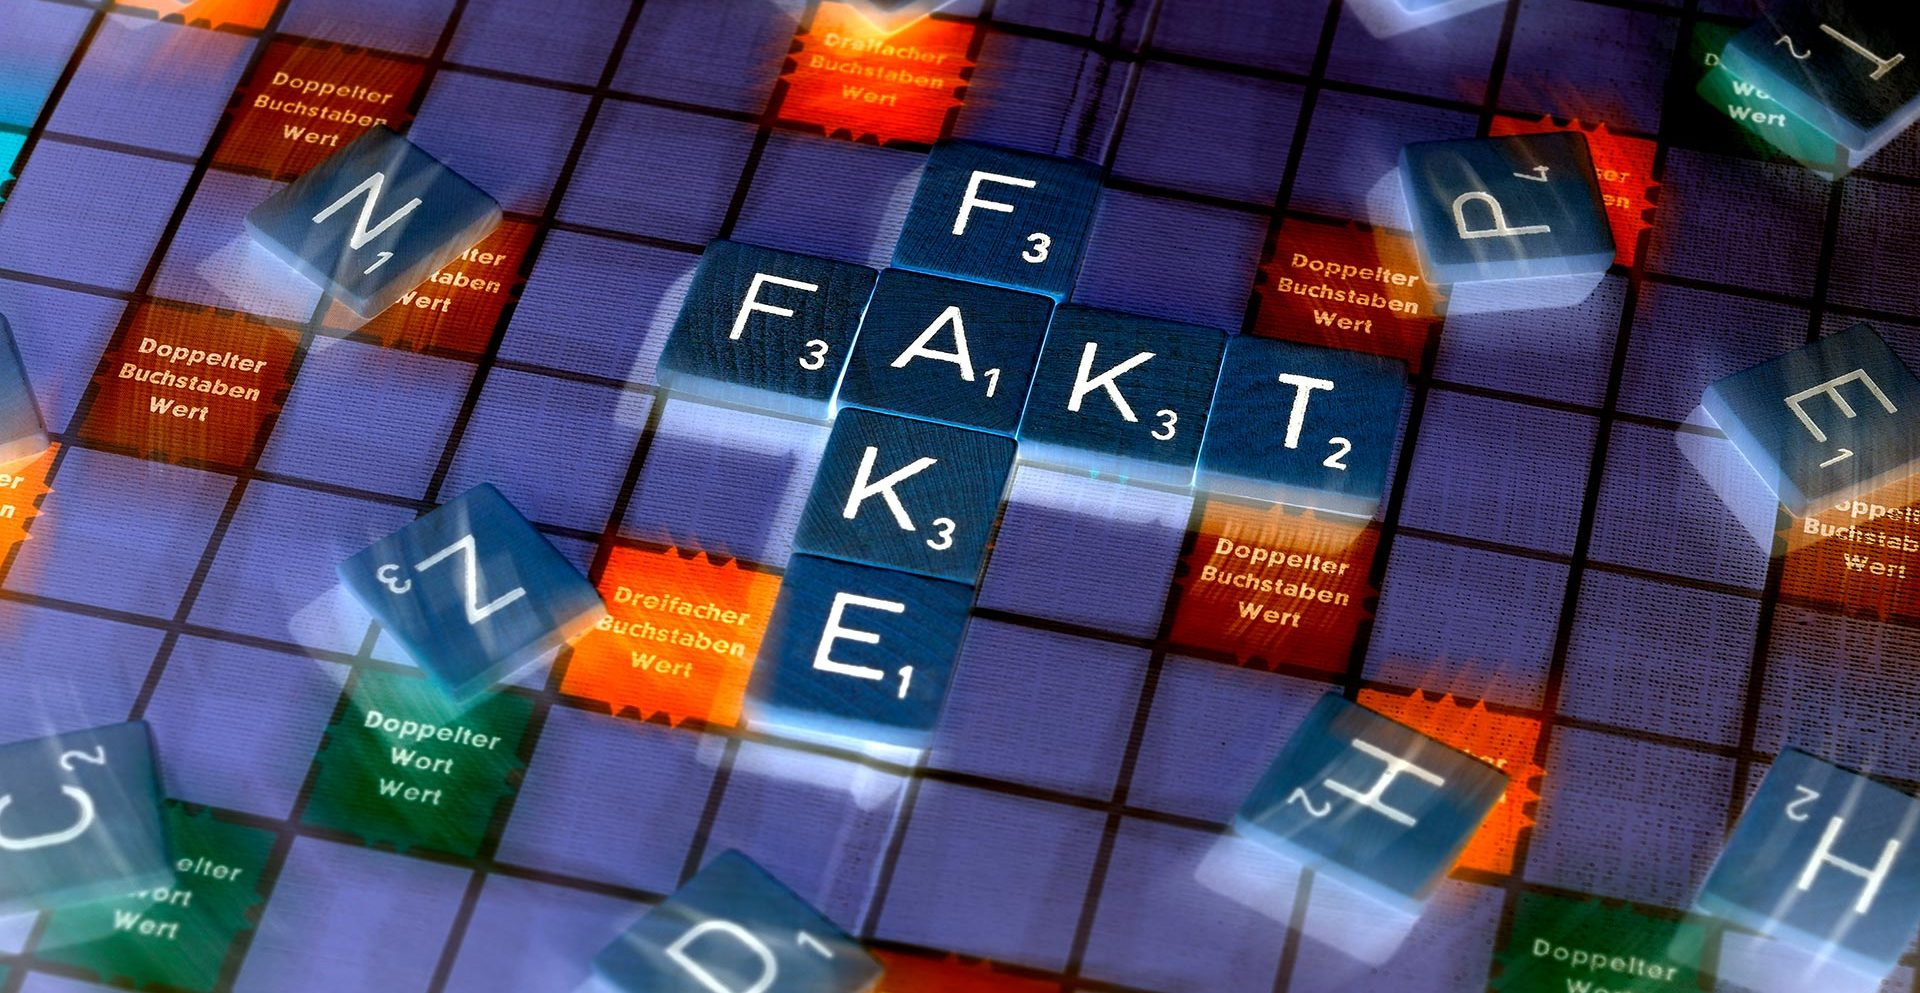 www.quarks.de